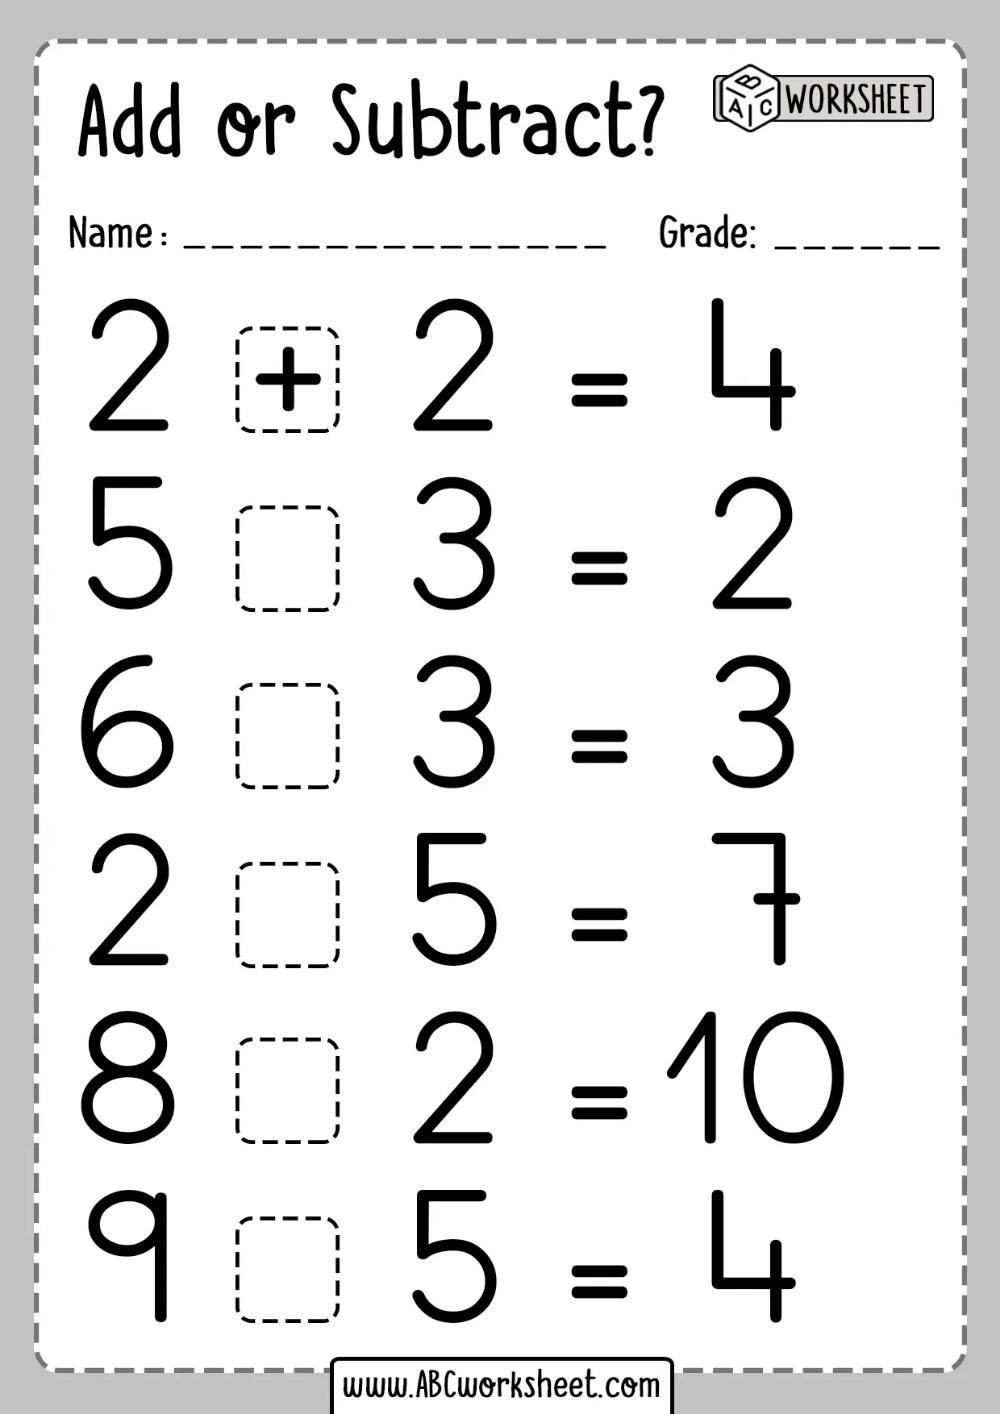 medium resolution of Addition and Subtraction worksheets   Addition and subtraction worksheets